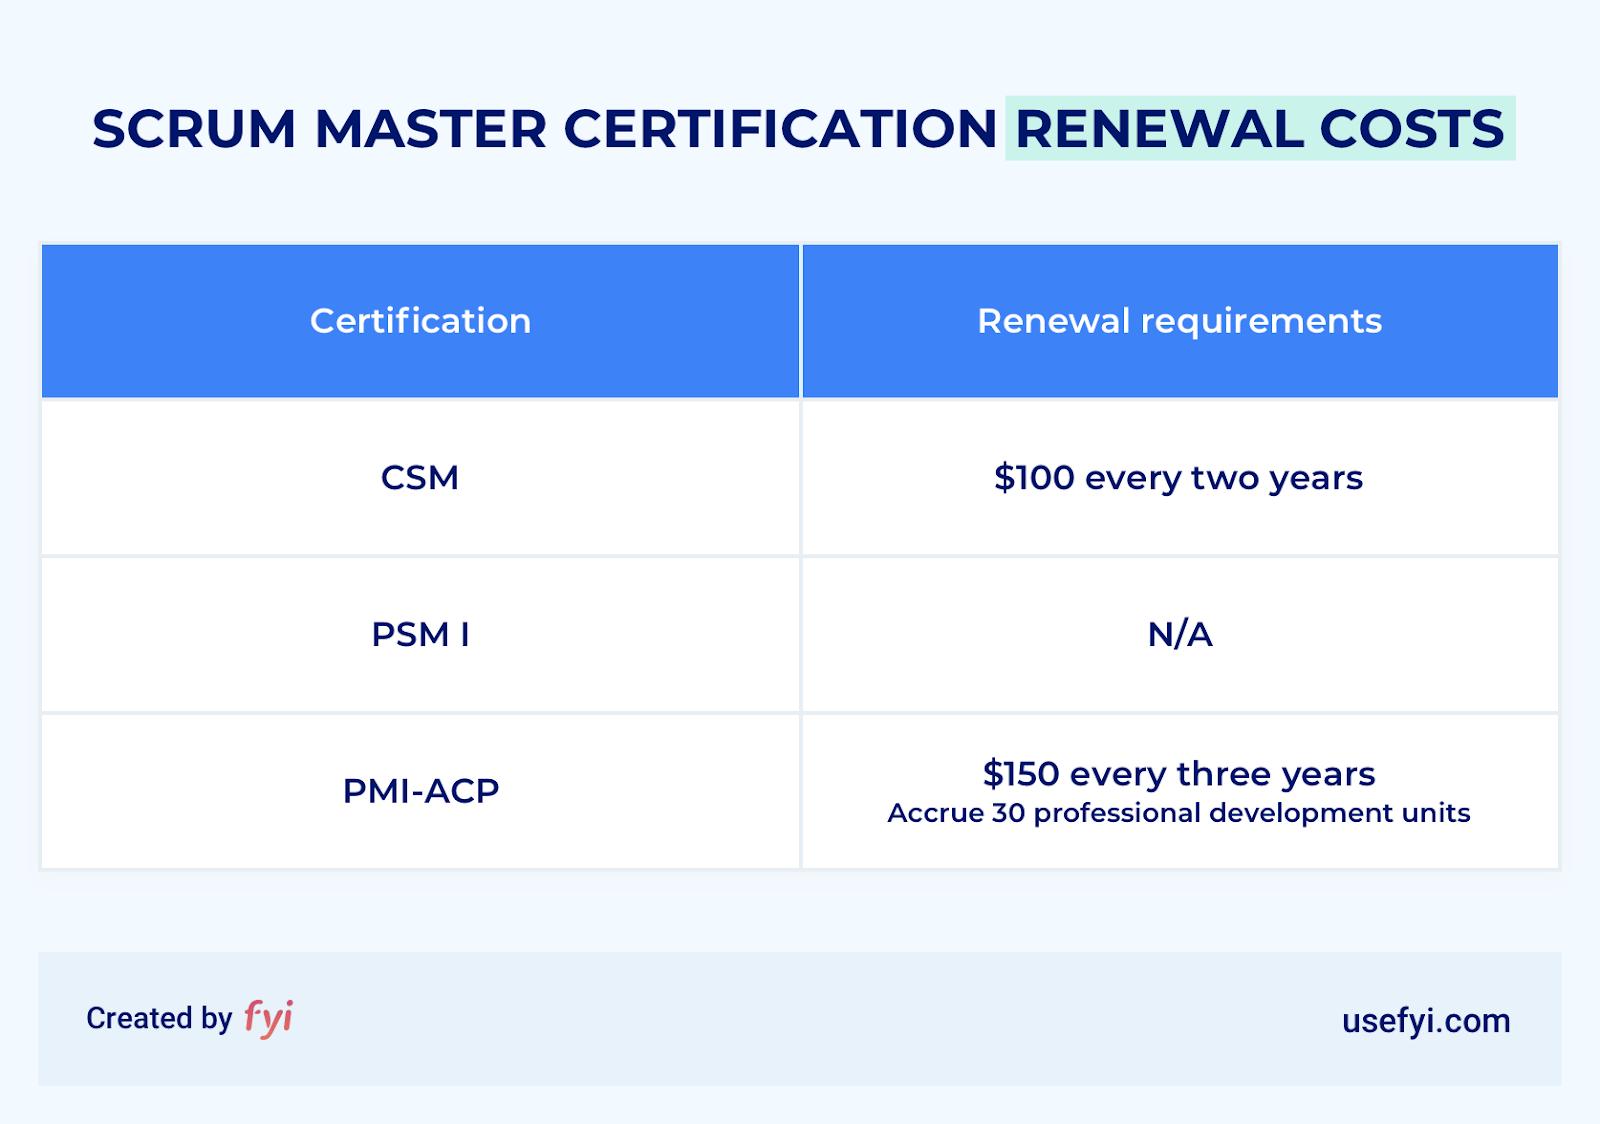 scrum master certification renewal costs